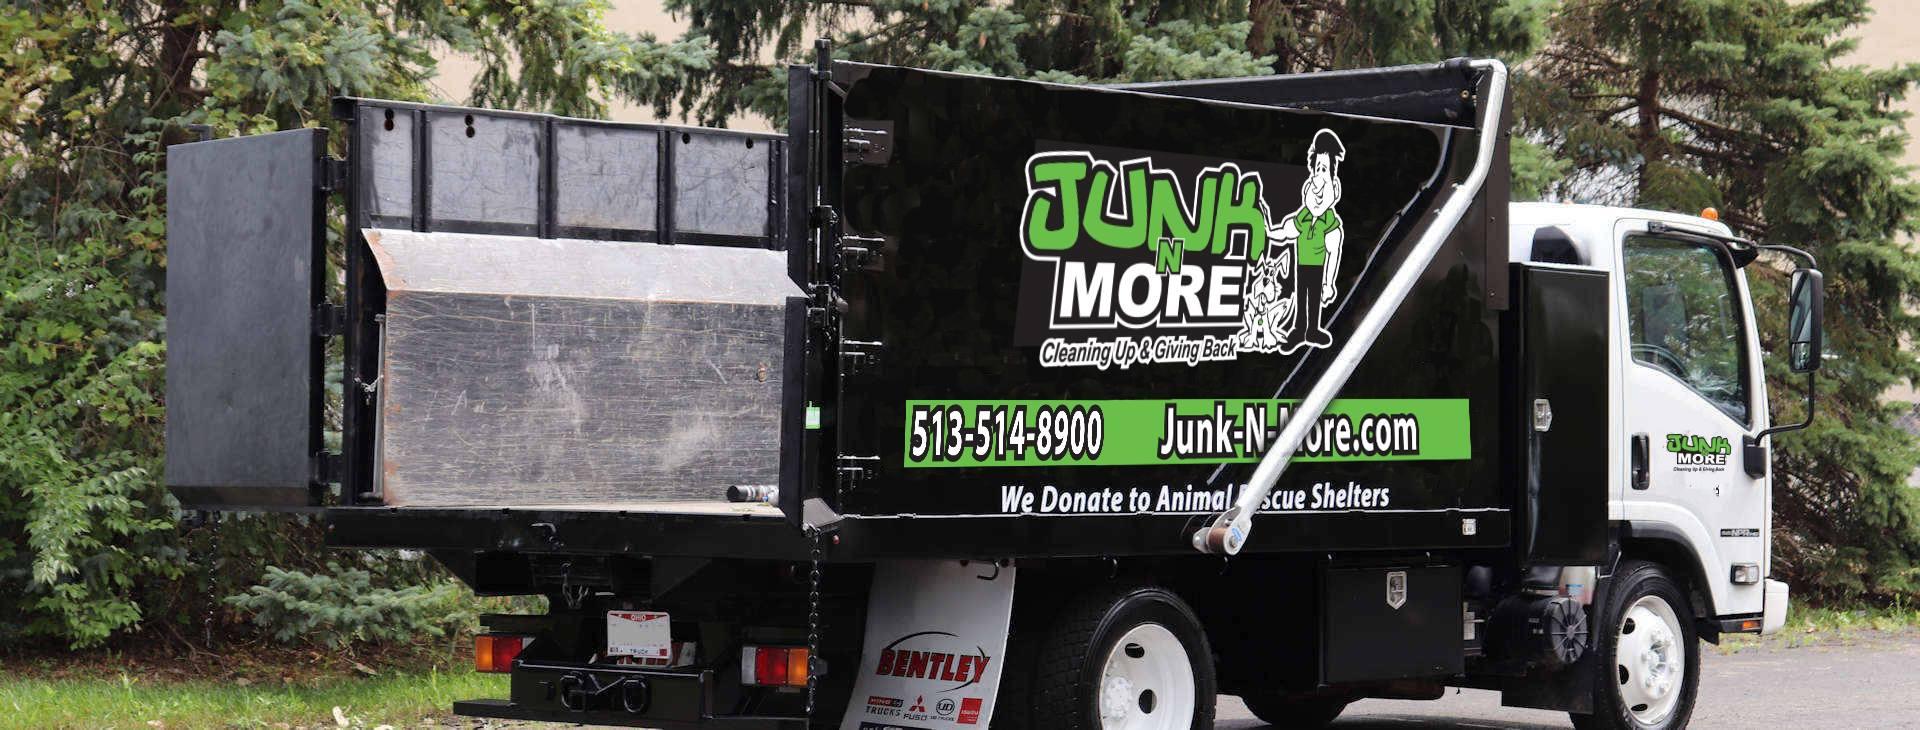 Junk N More Truck